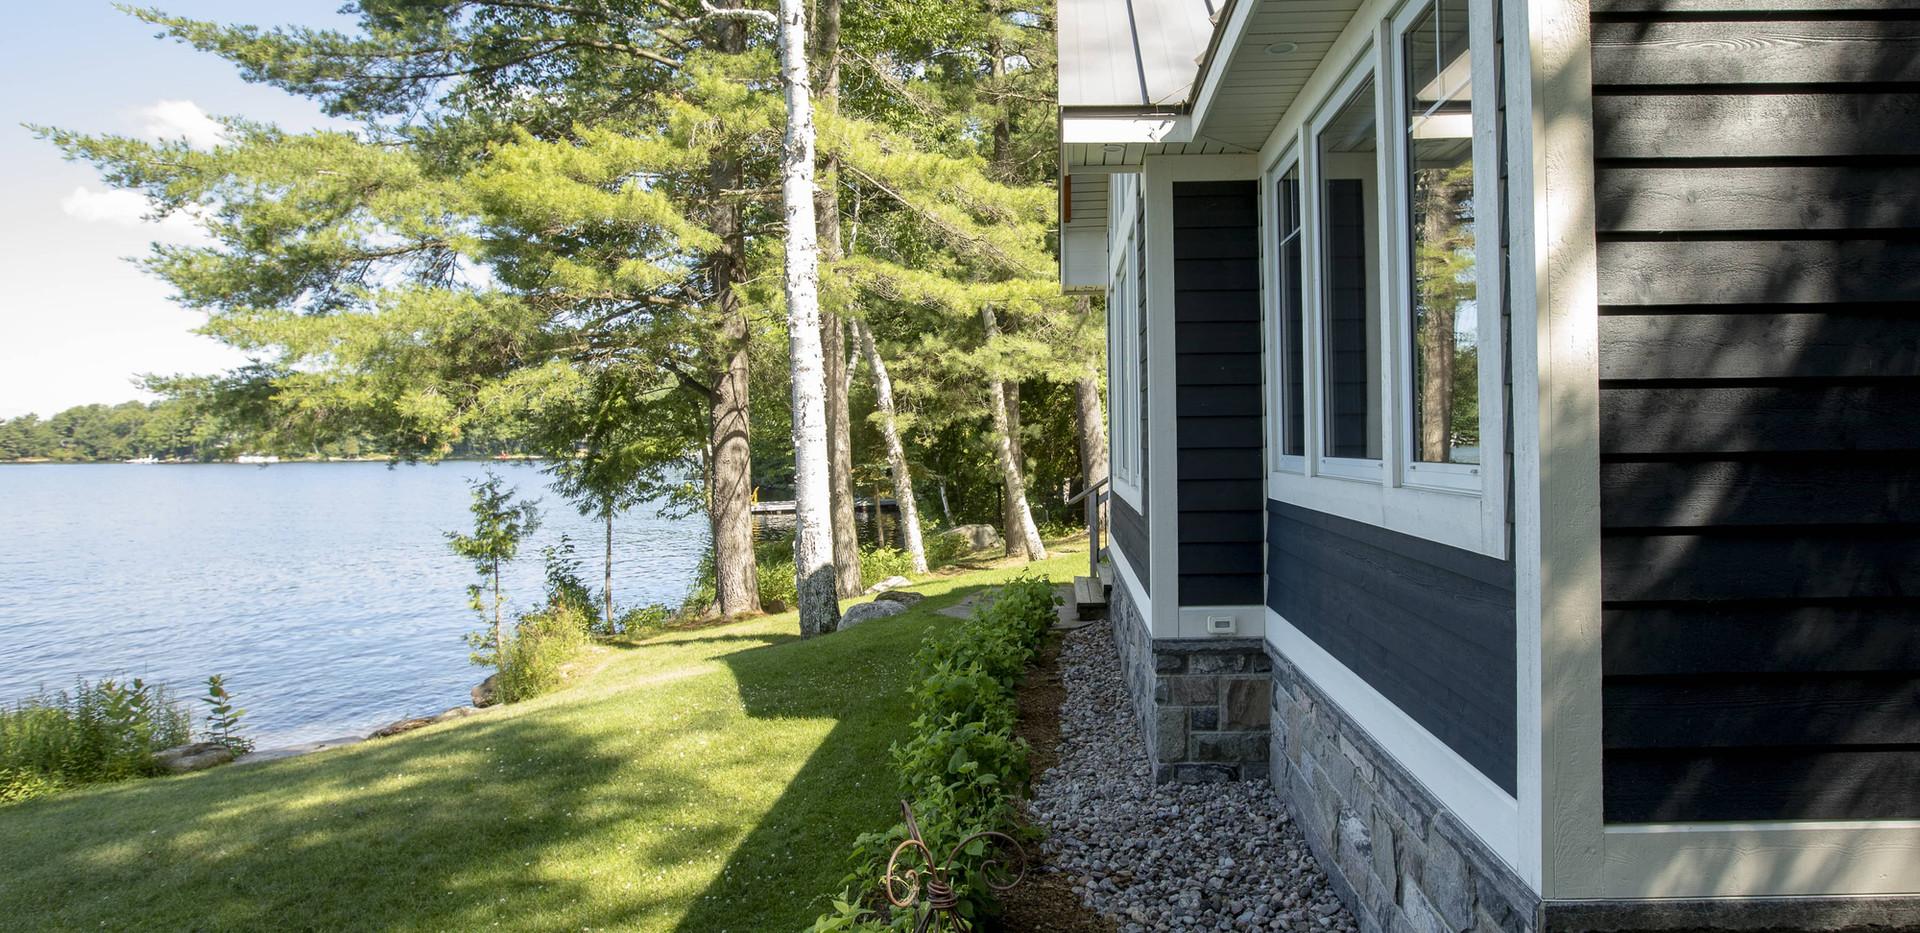 Small Blue Cottage on Water Edenlane Muskoka